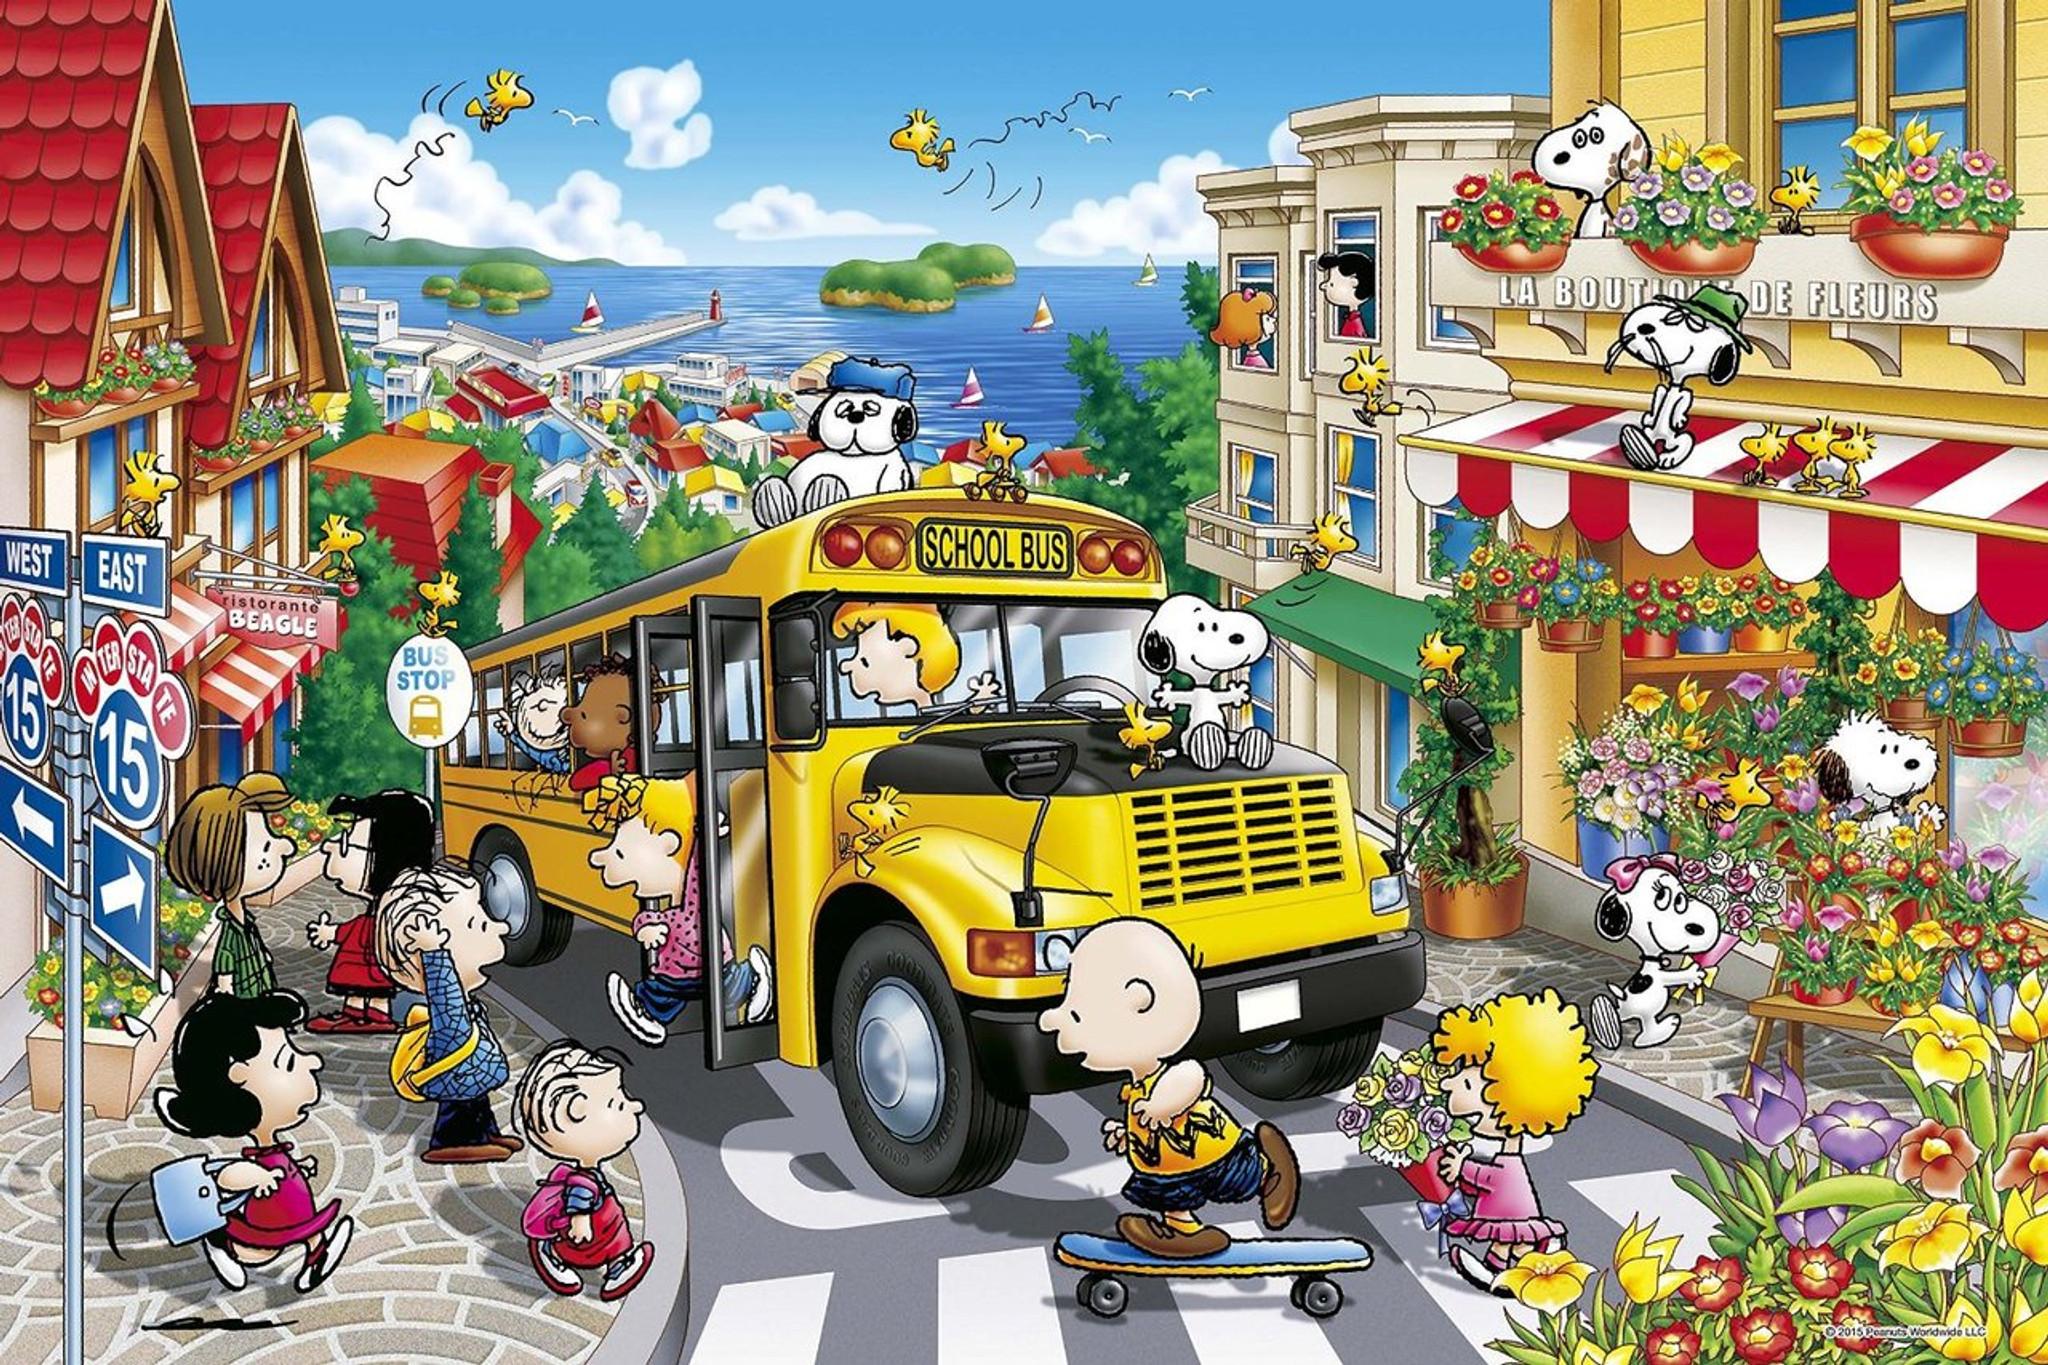 Epoch Jigsaw Puzzle 11-527 Peanuts Snoopy Happy School Bus